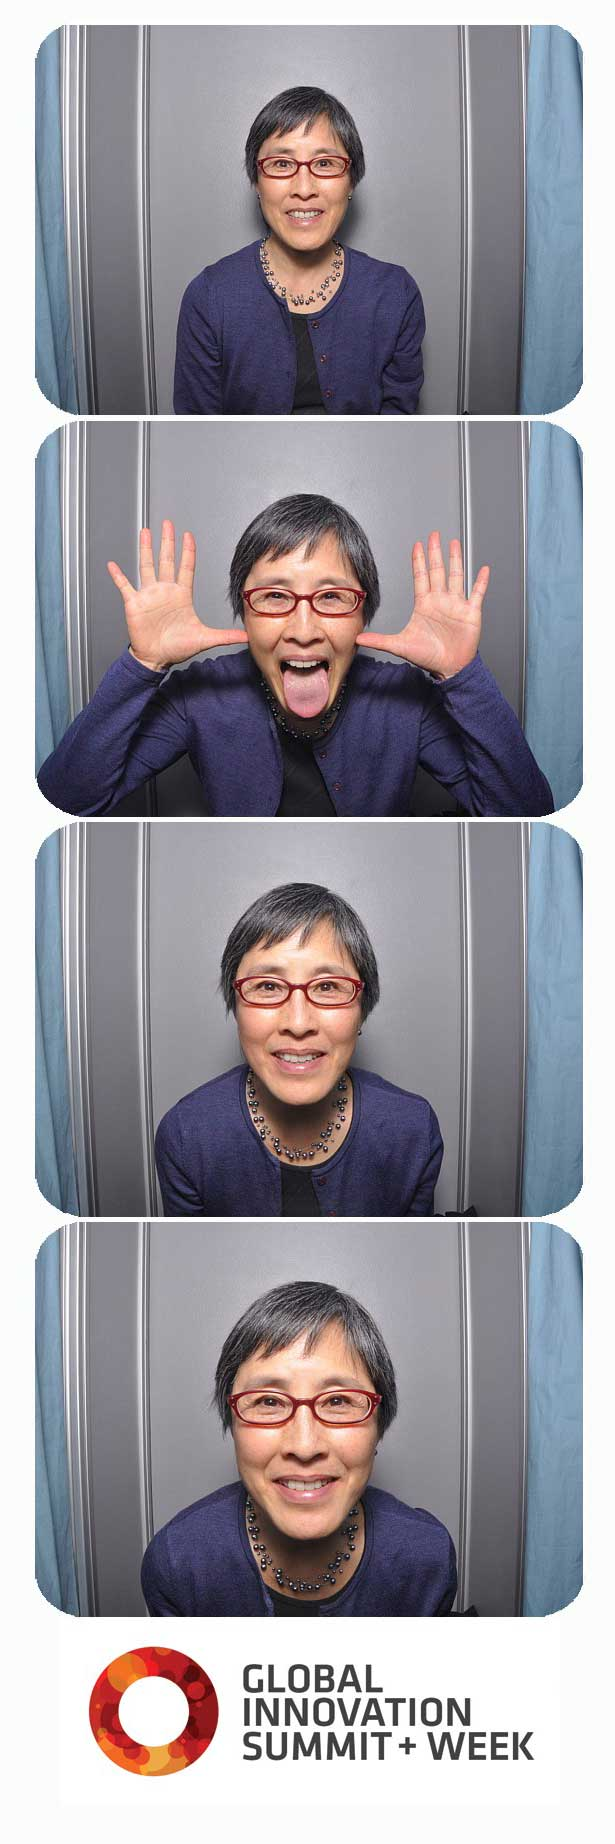 photo-booth-_601.jpg